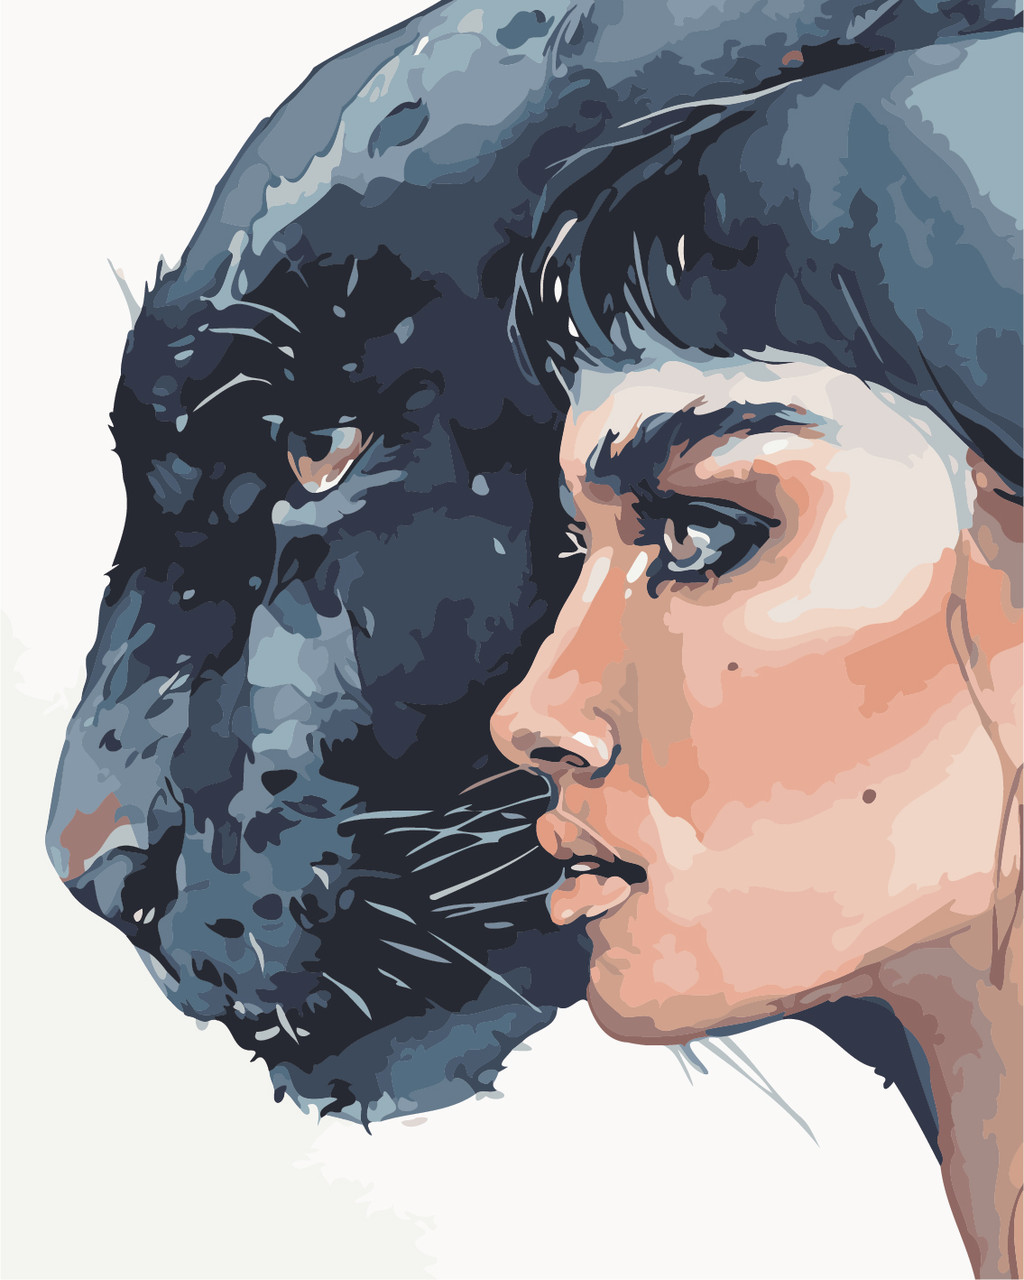 Картина по номерам ArtStory Девушка и пантера 40*50см